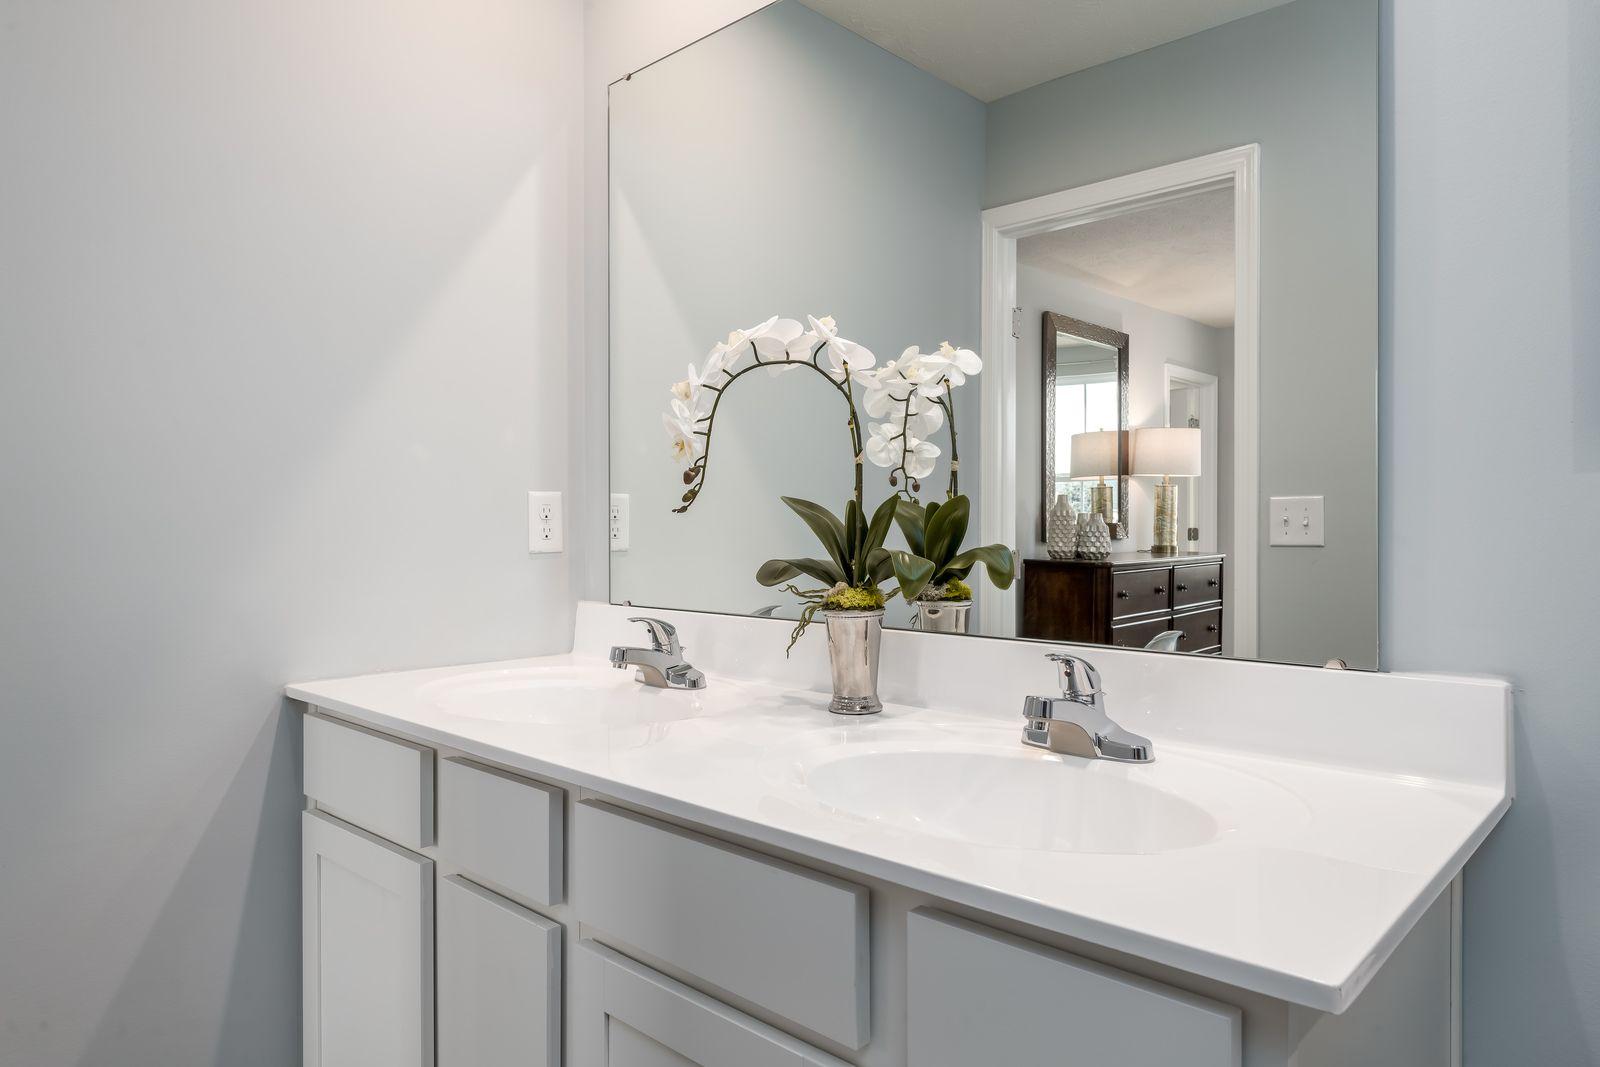 Bathroom featured in the Birch By Ryan Homes in Washington, VA